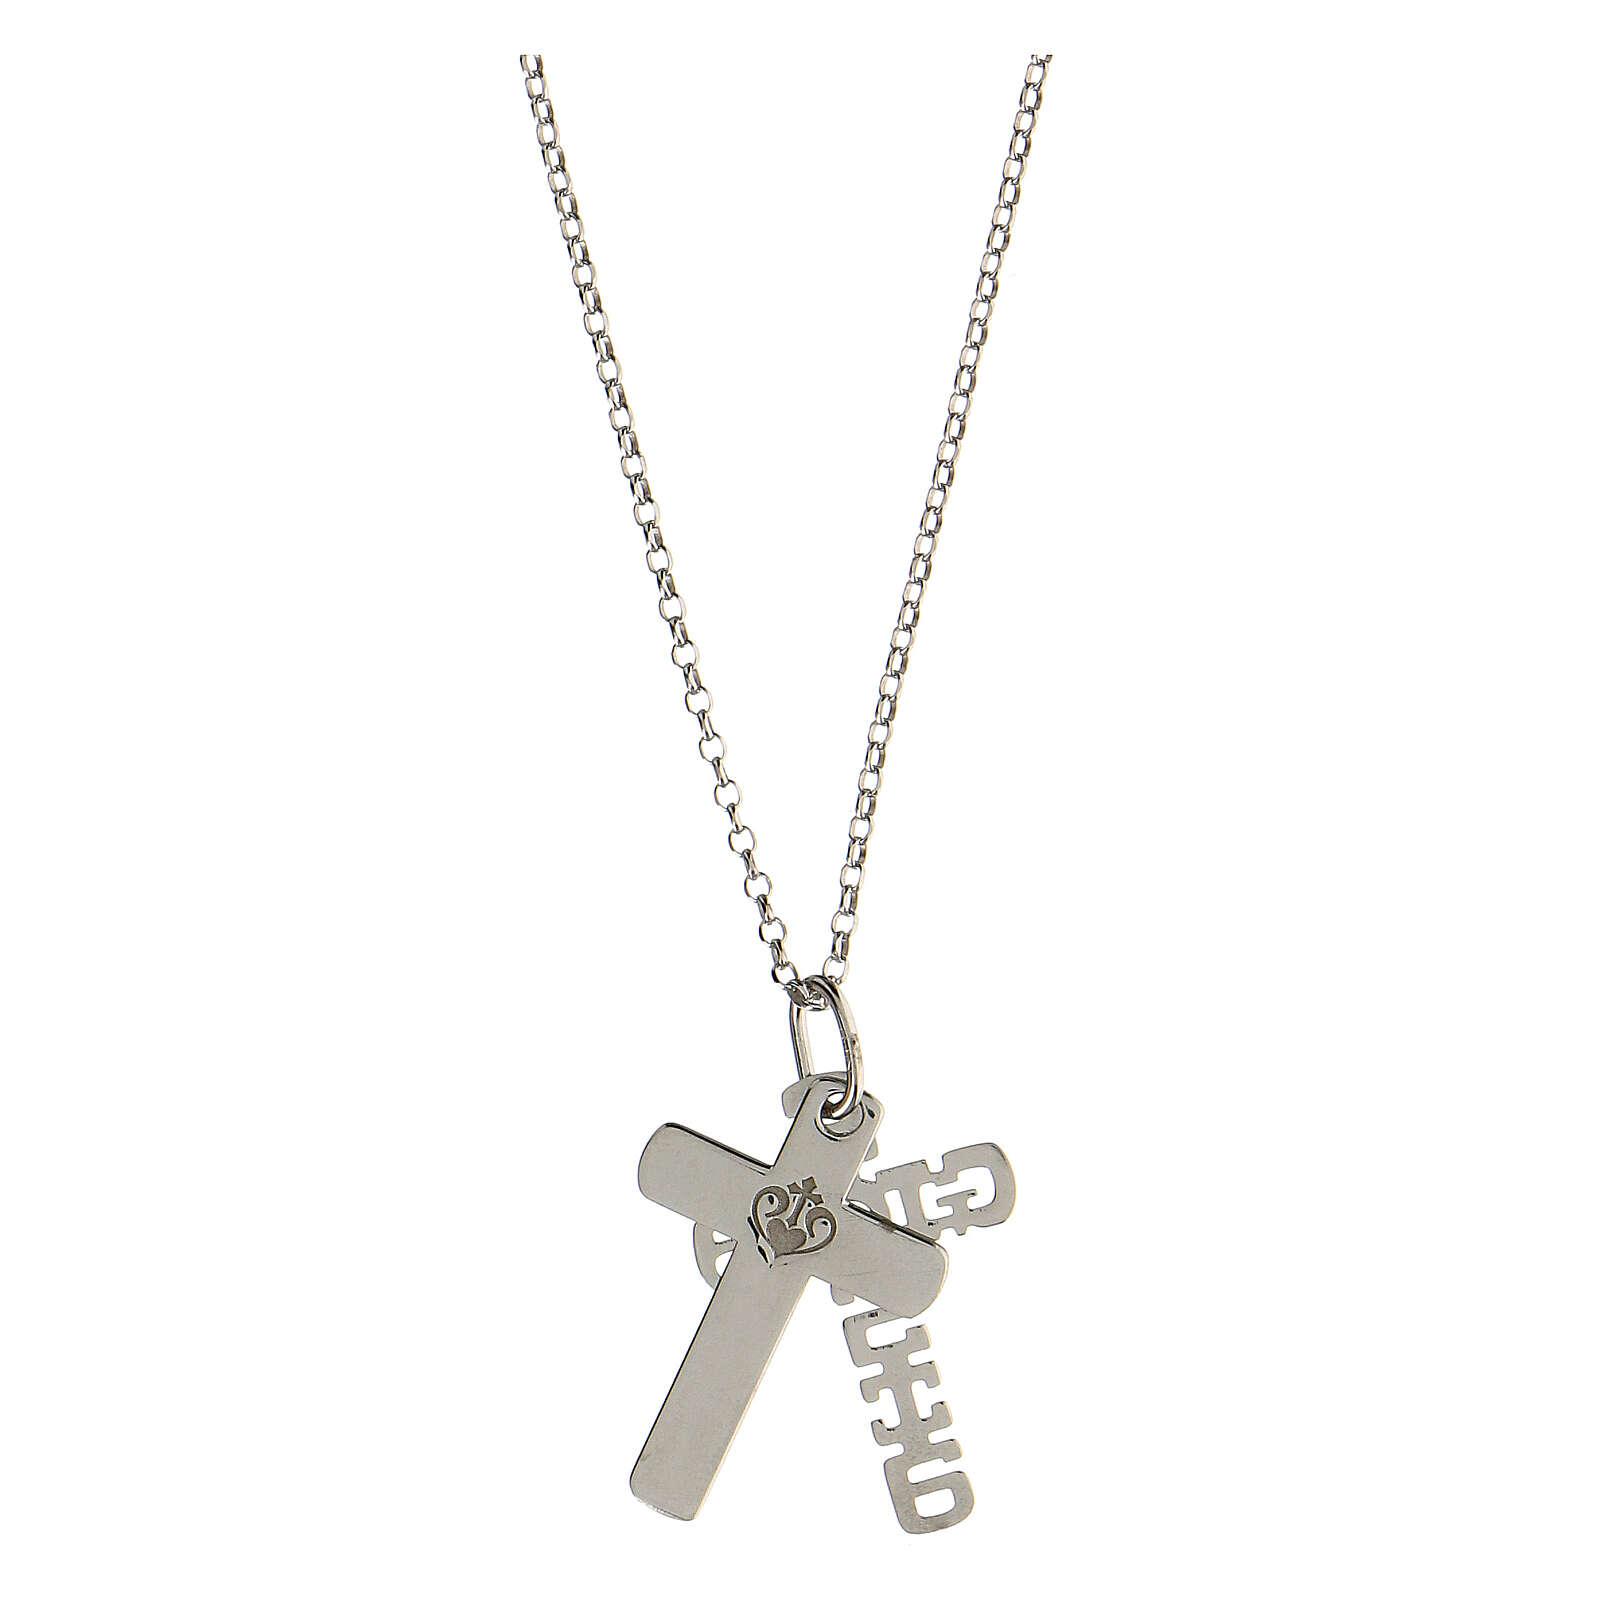 Pendentif E Gioia Sia double croix argent 925 4